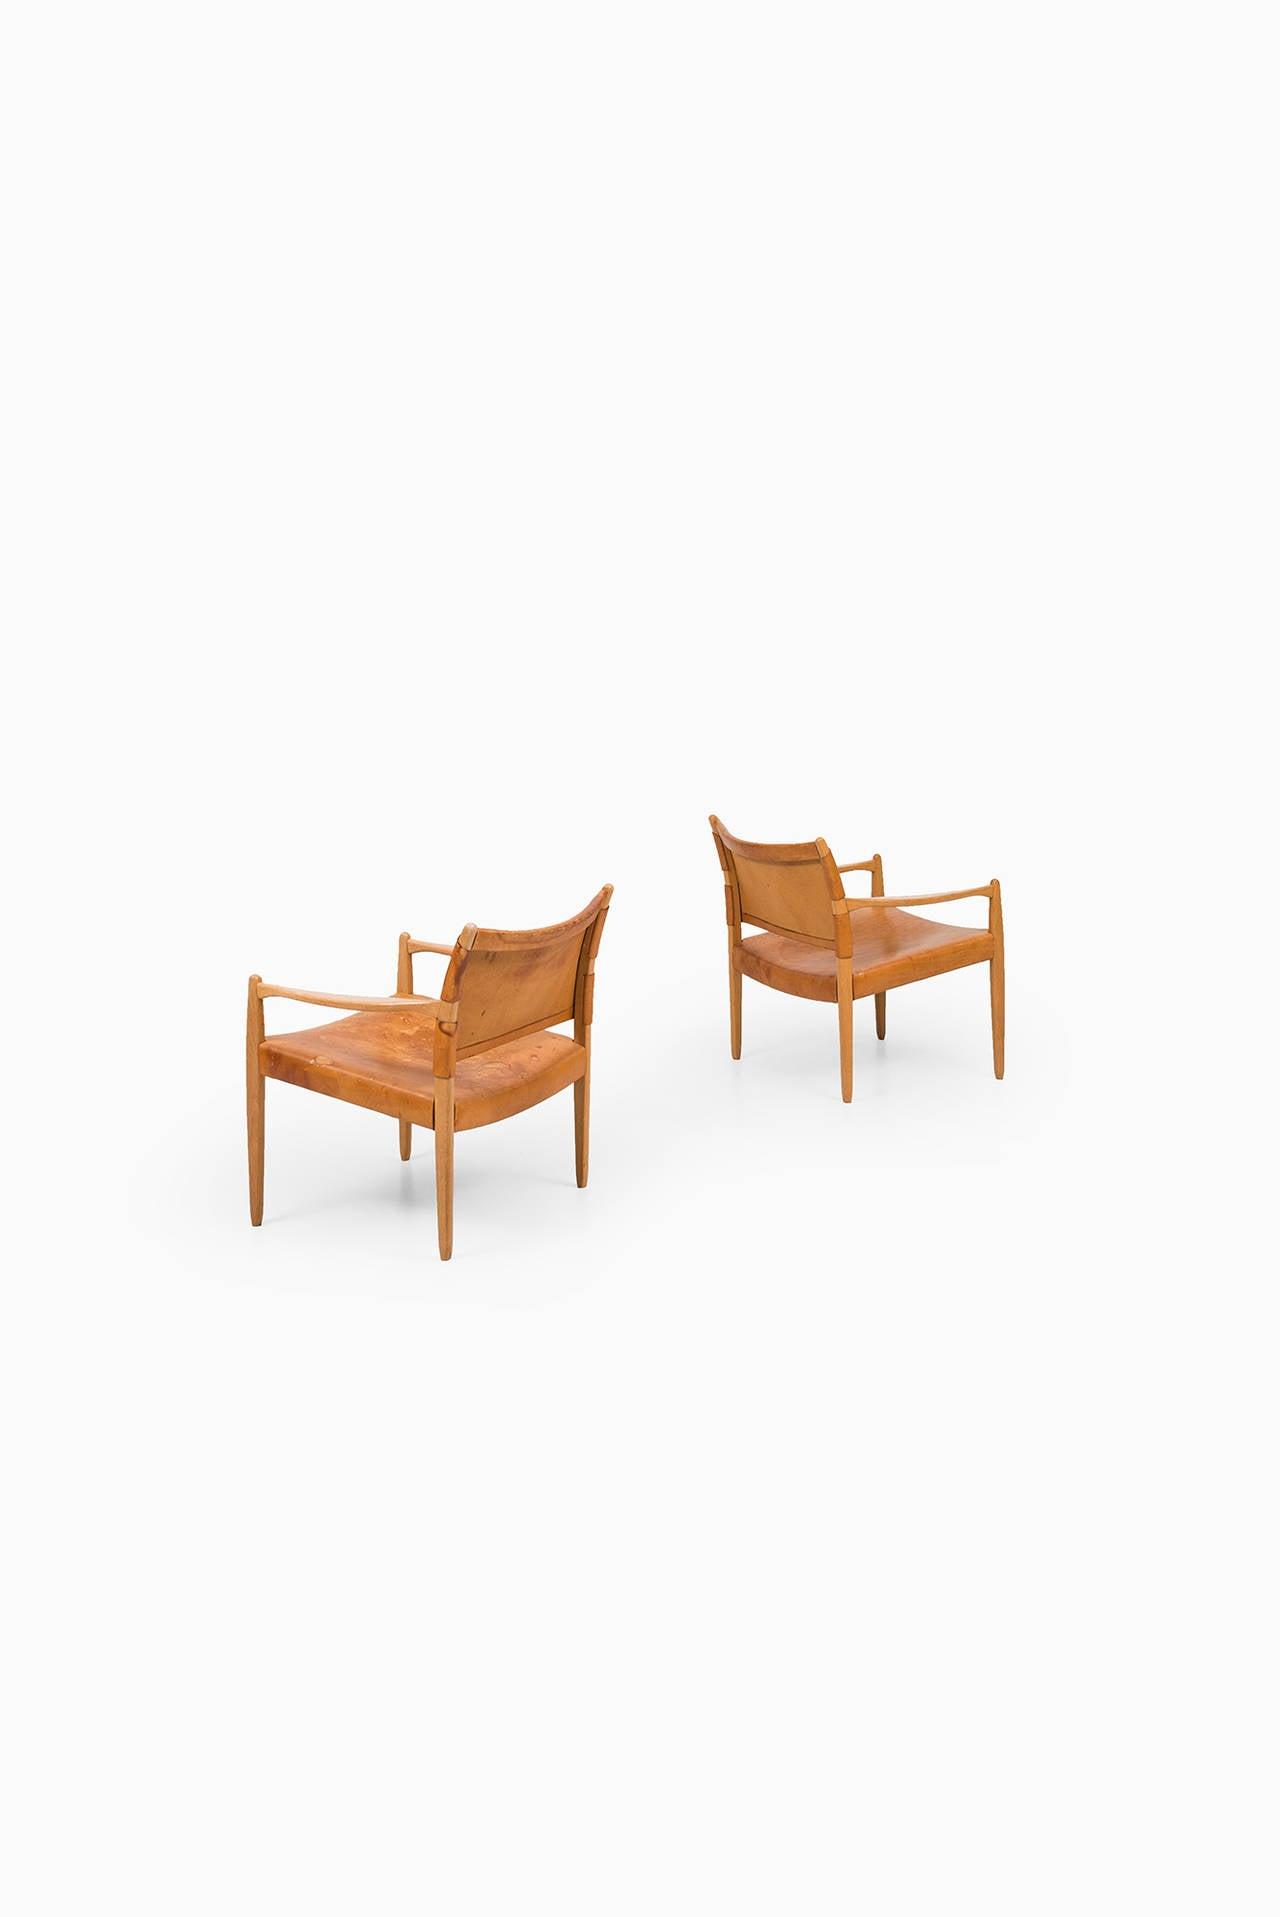 Per-Olof Scotte easy chairs model Premiär produced in Sweden 2